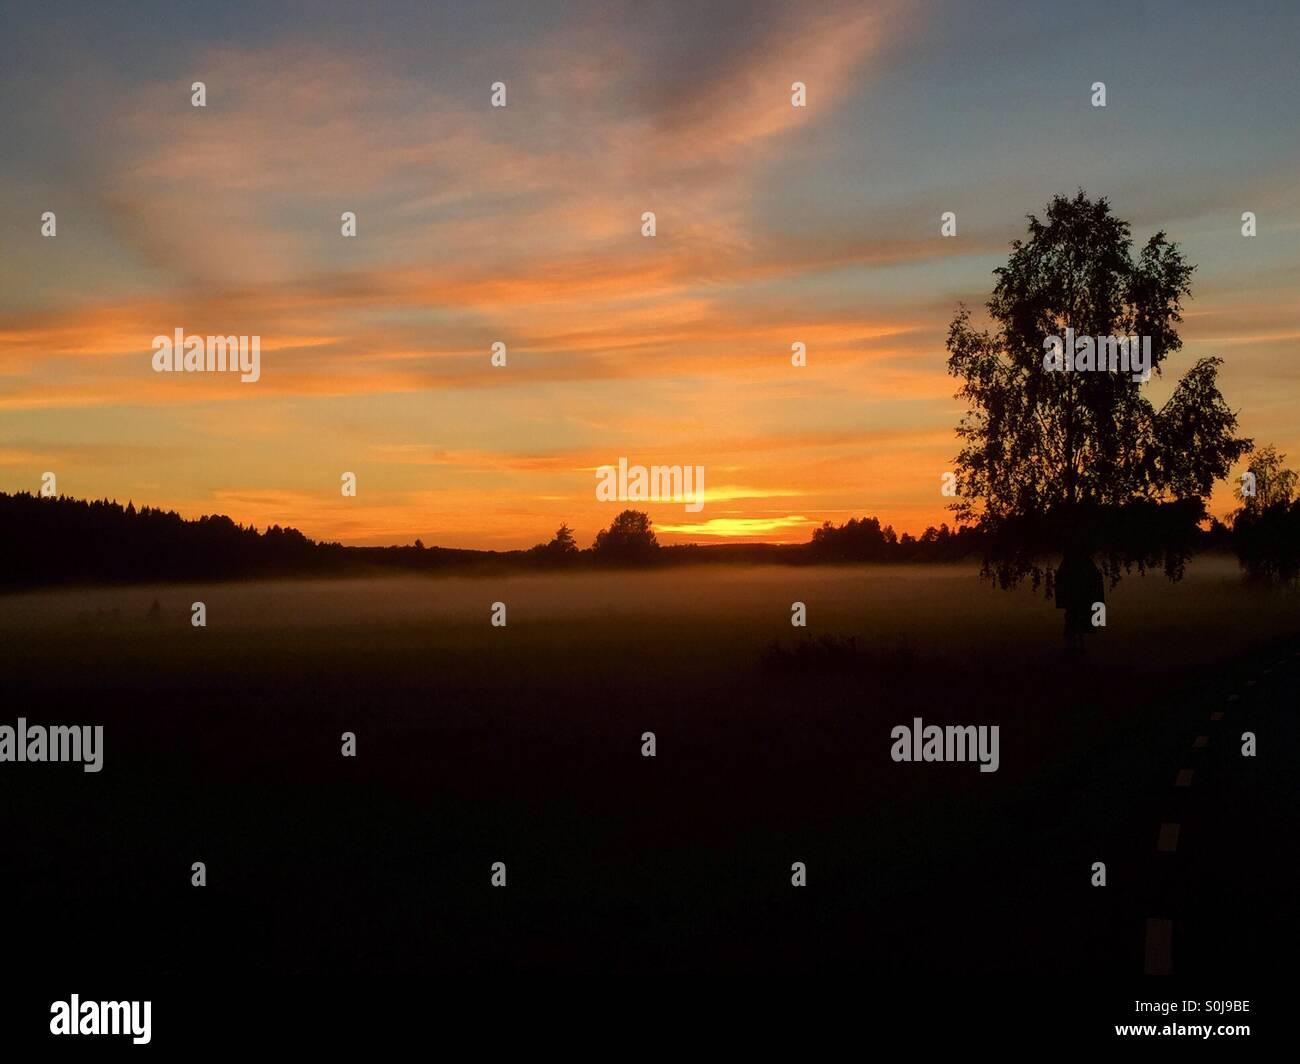 Sunset with fog - Stock Image